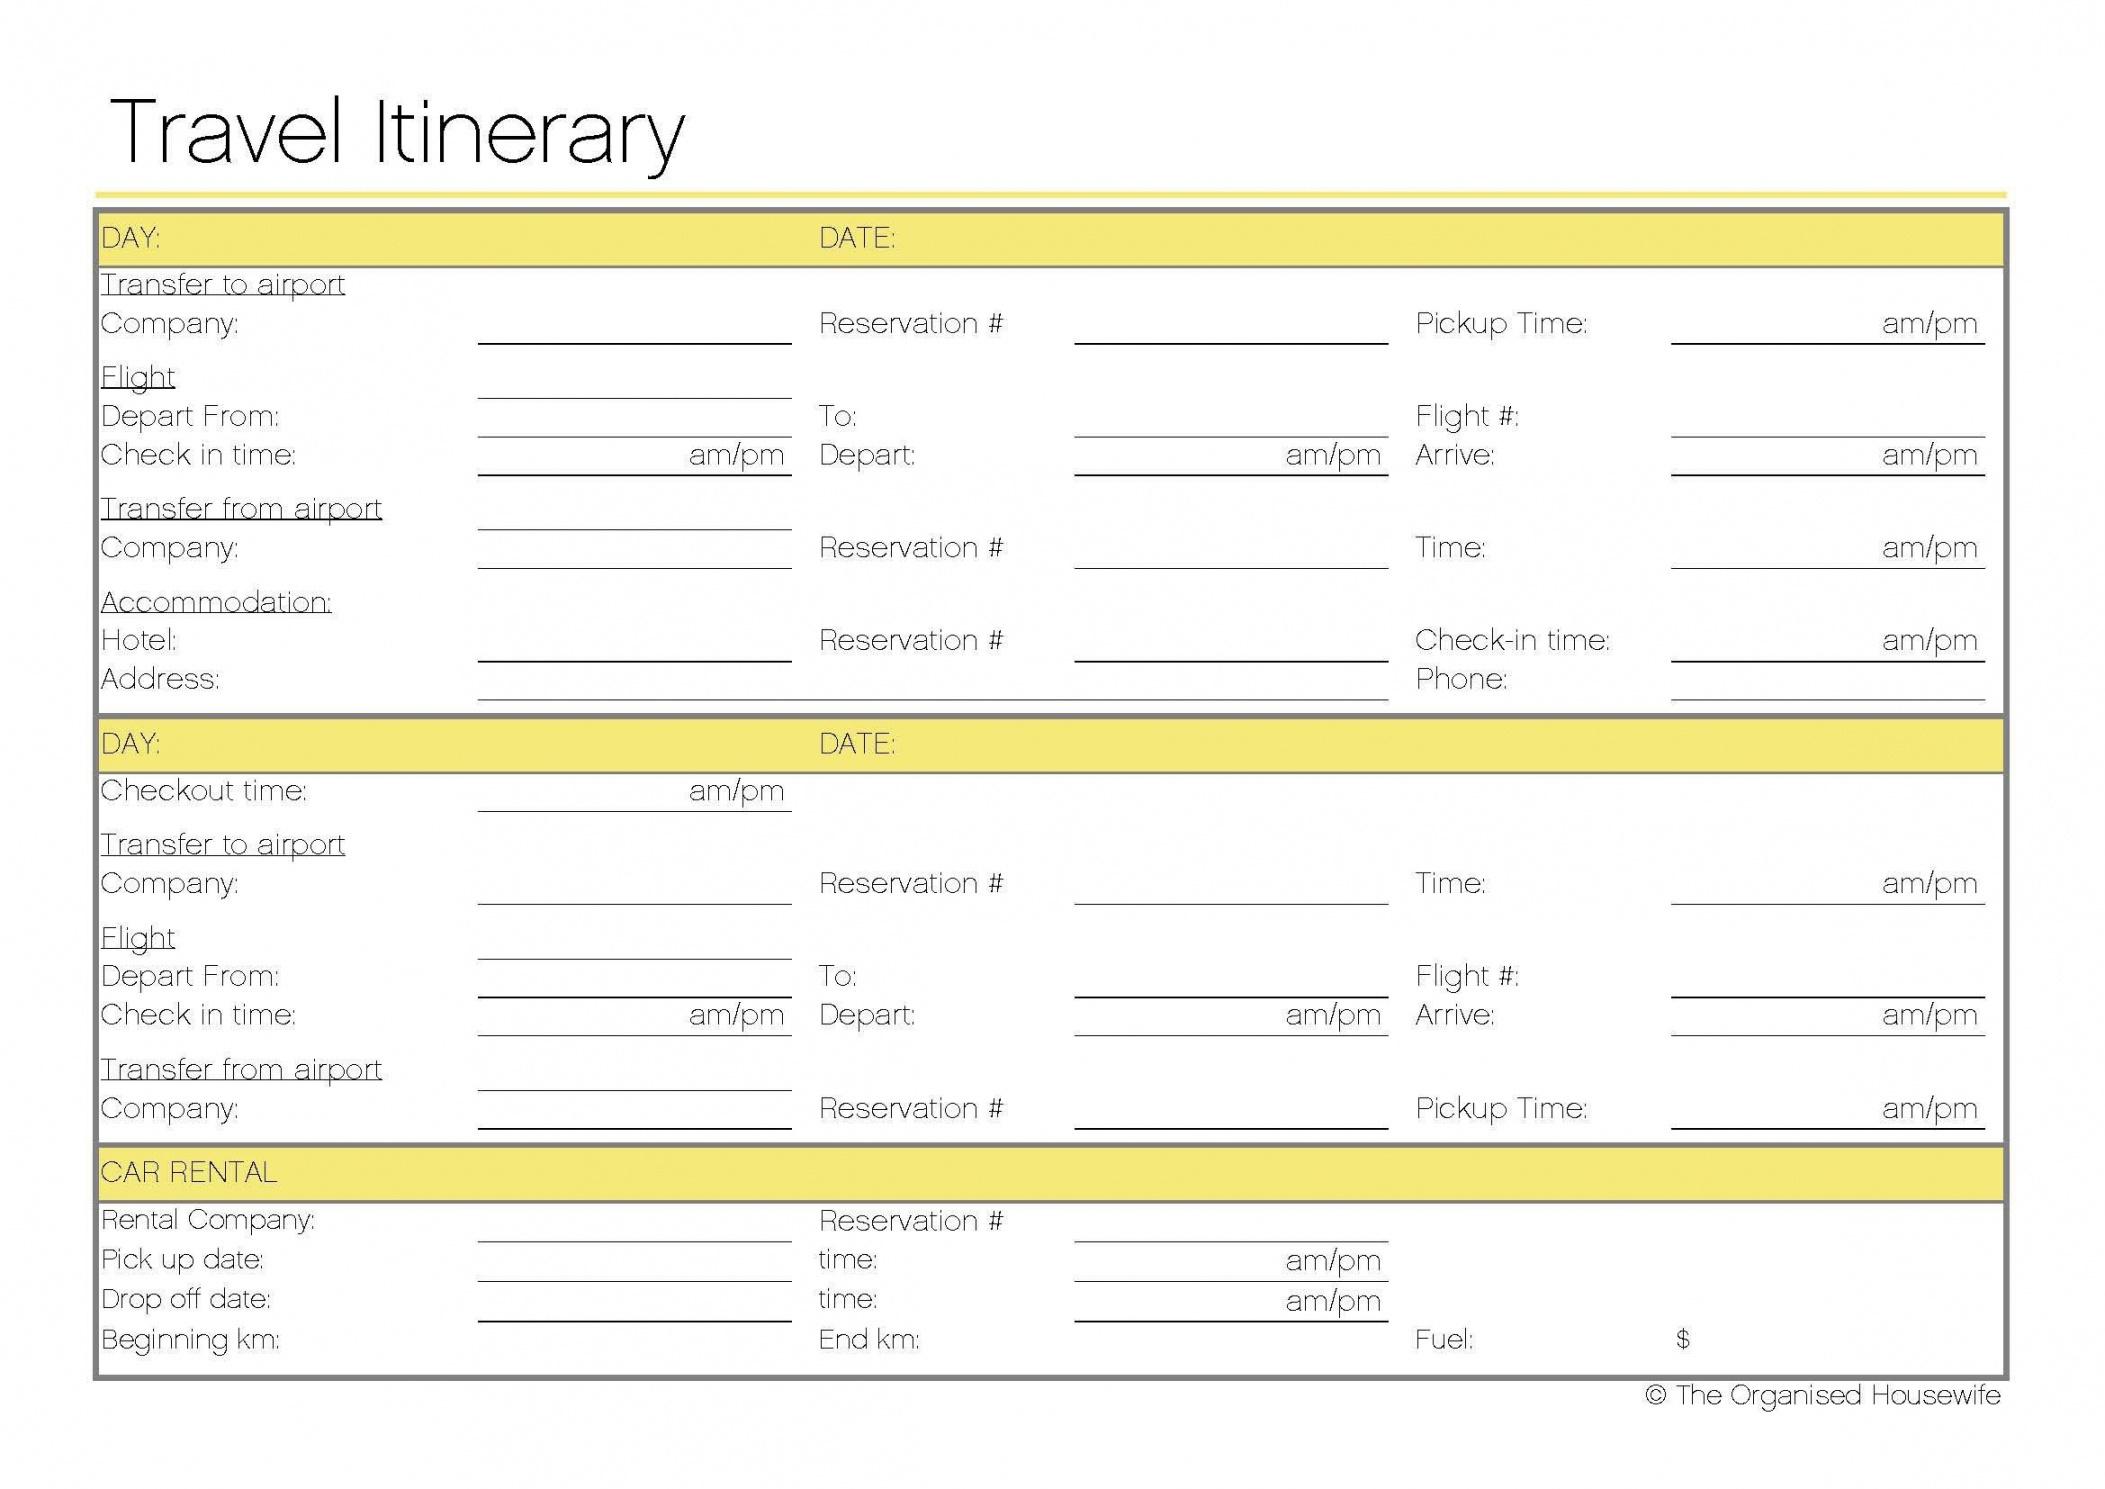 Free Printable Travel Itinerary Itineraries Etc Travel Travel Agency - Free Printable Itinerary